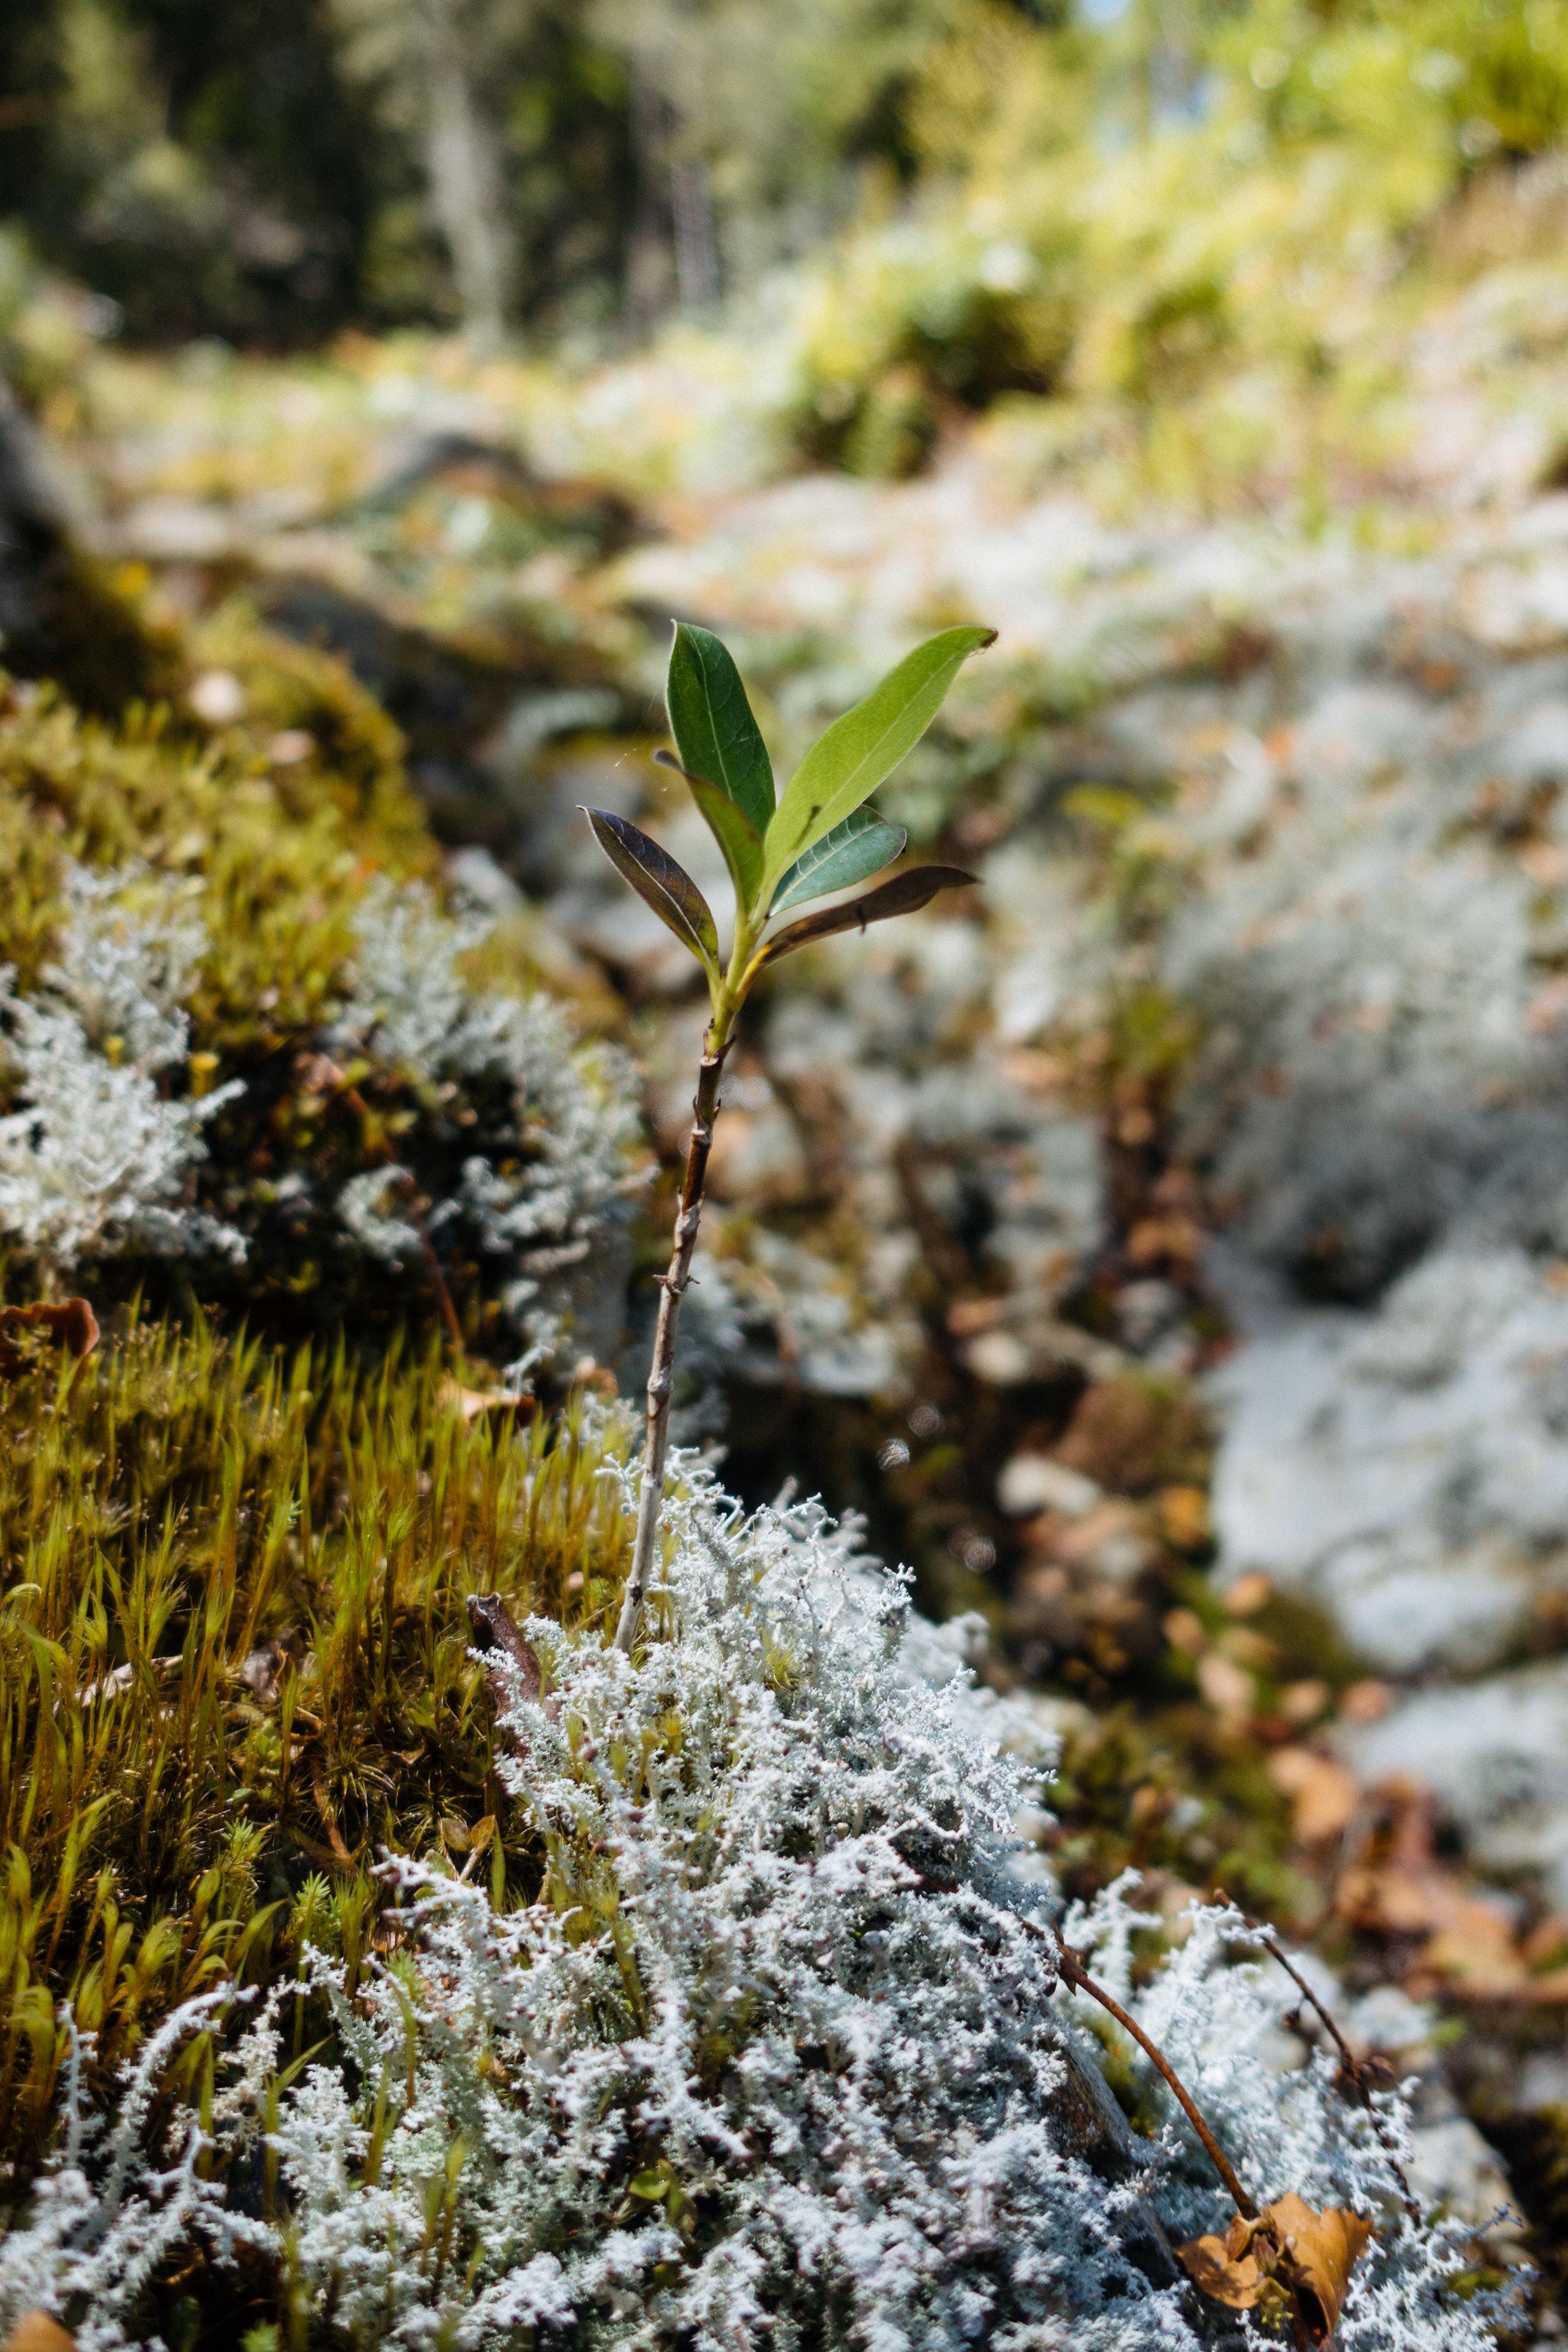 Leaves poking through moss